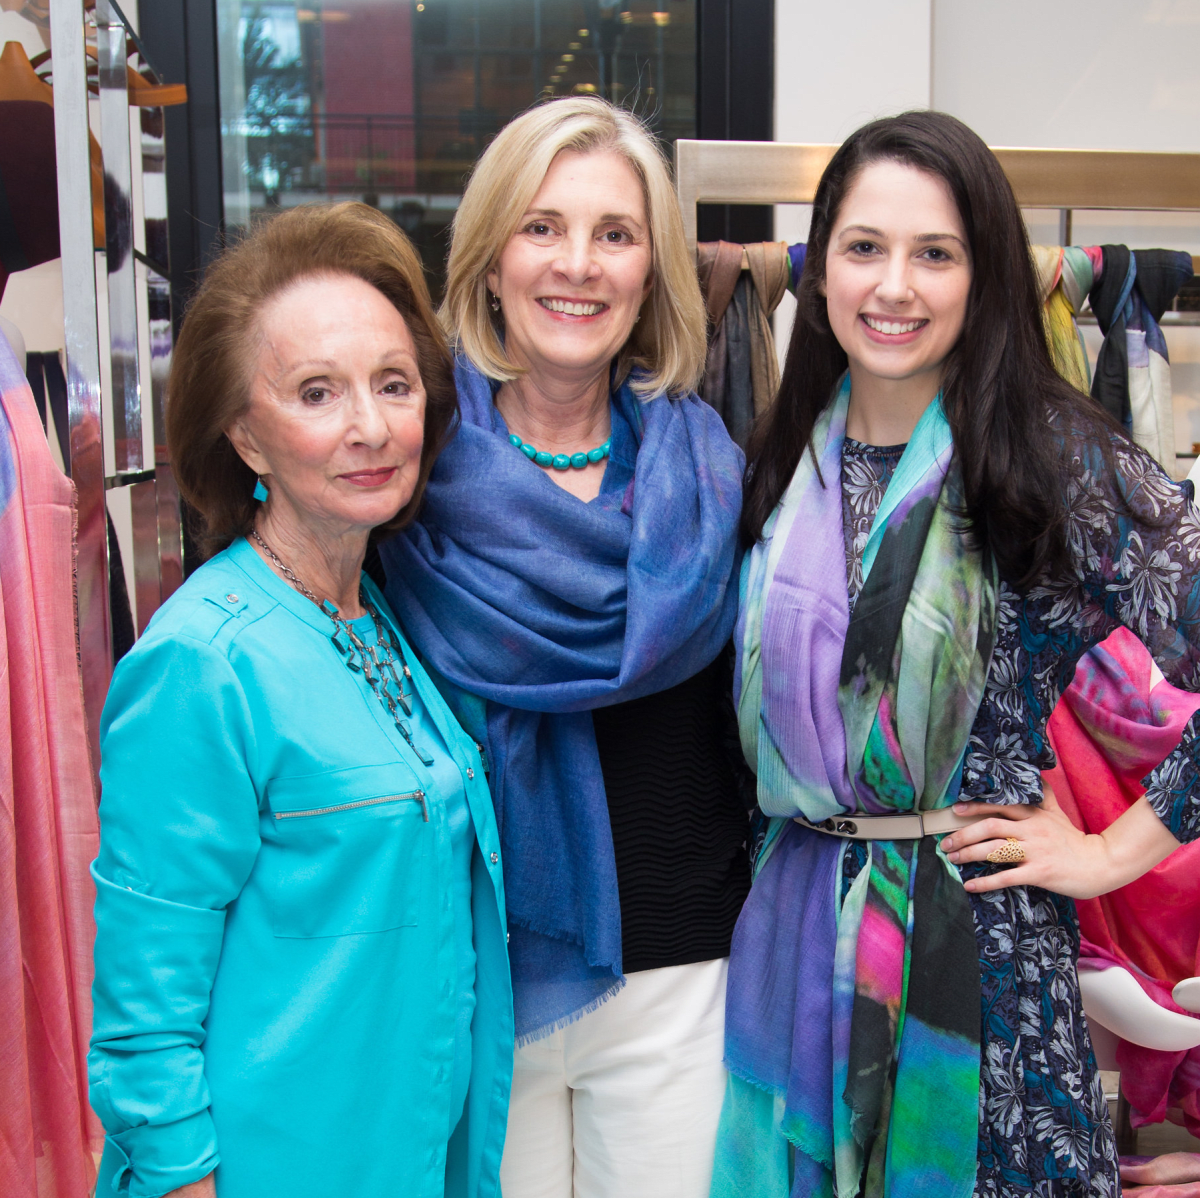 News, Shelby, Ovarian Cancer Awareness Month. tootsies, Sept. 2015, Marilyn Biles, Michele Alvarado, Anna Wilson